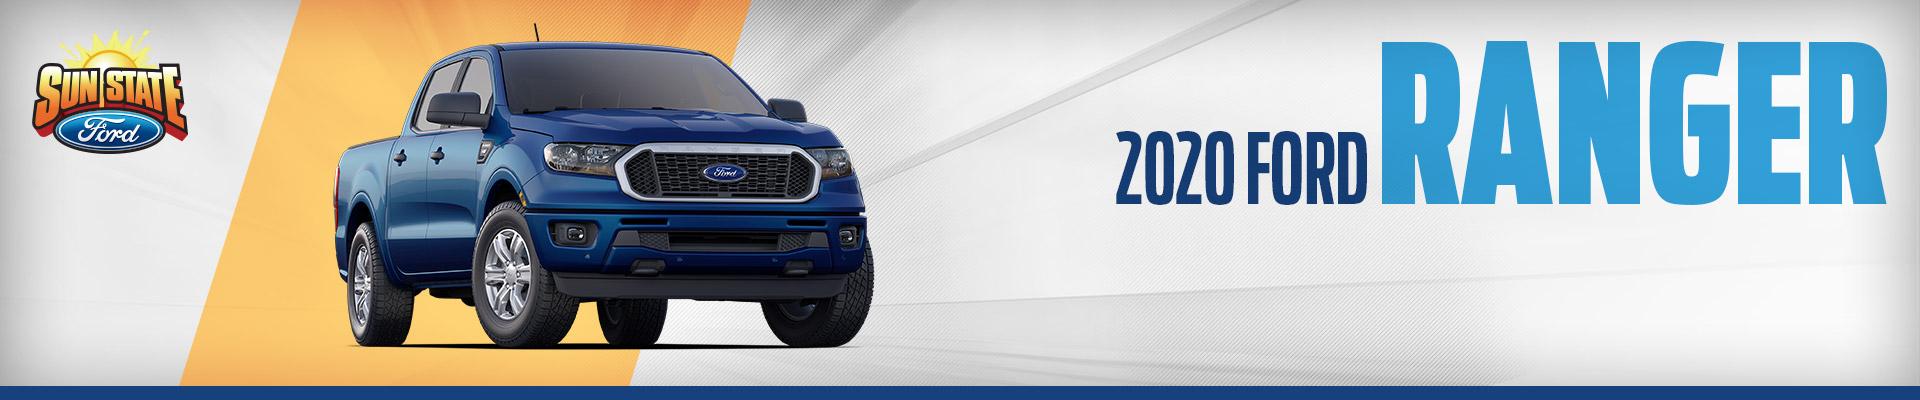 2020 Ford Ranger - Sun State Ford - Orlando, FL